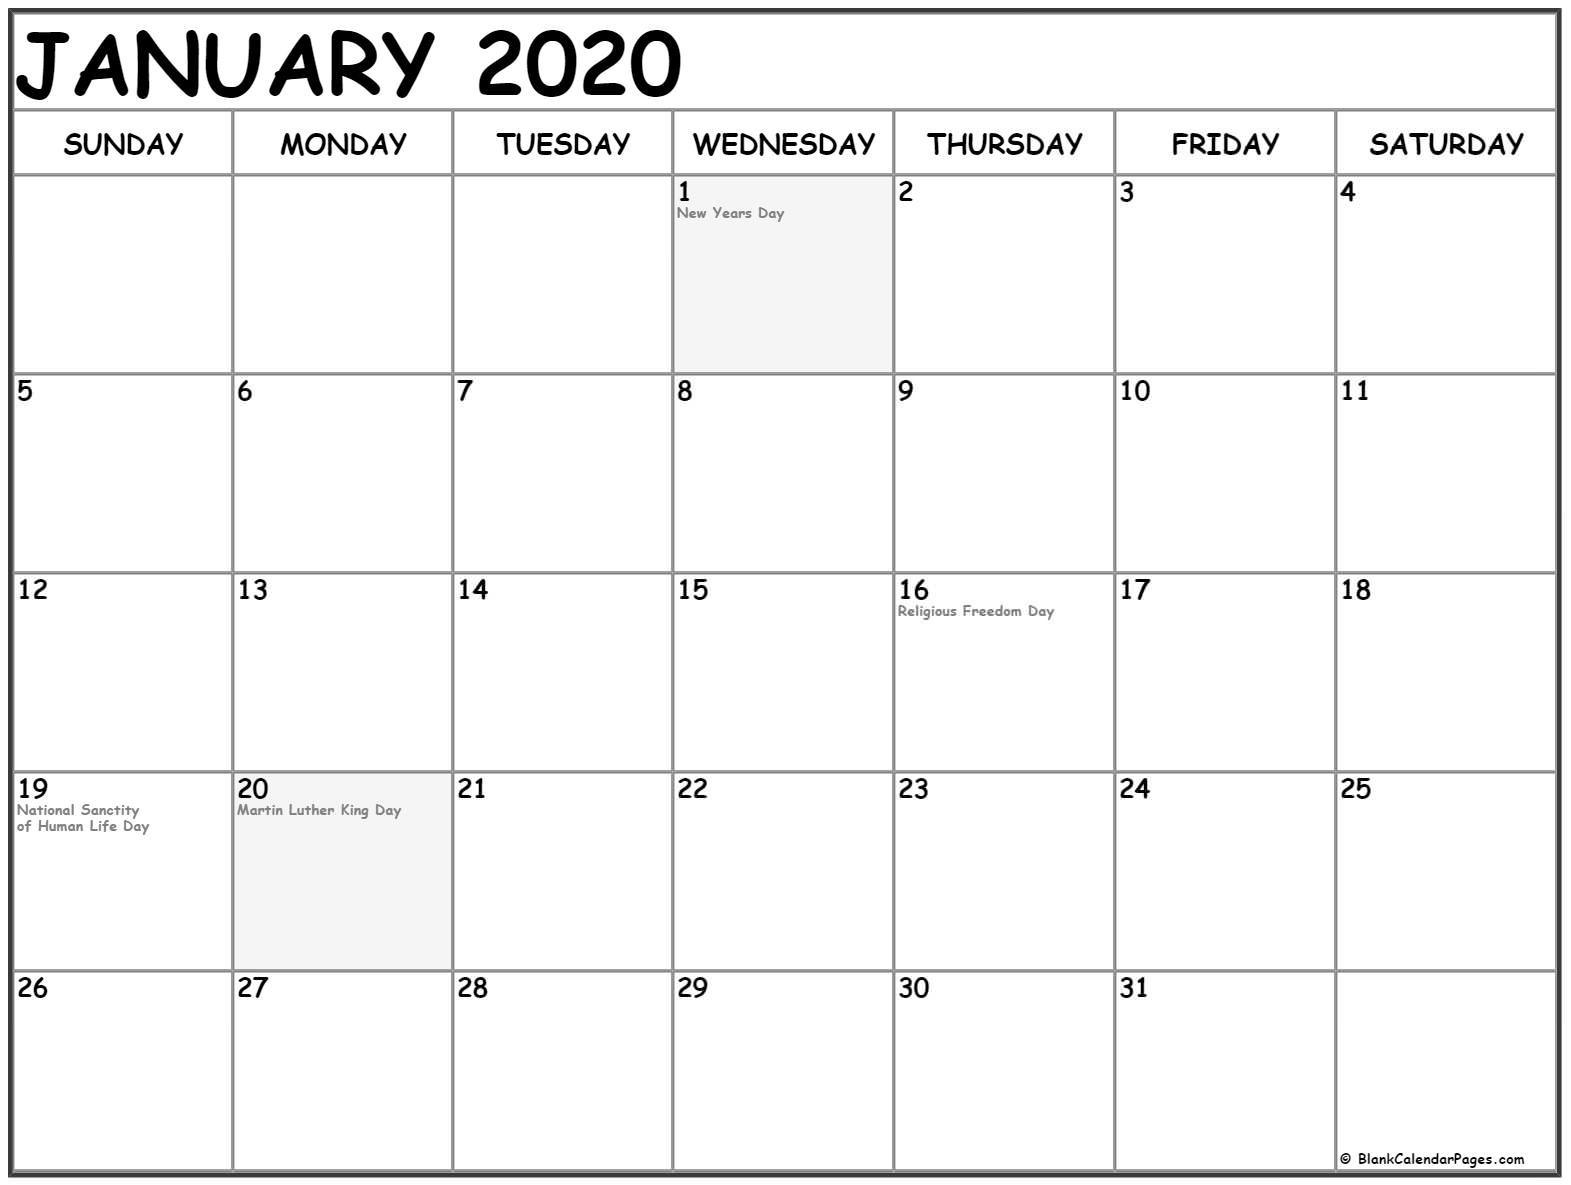 January 2020 Calendar Printable Templates Holidays - July-January 2020 Calendar With Holidays Usa